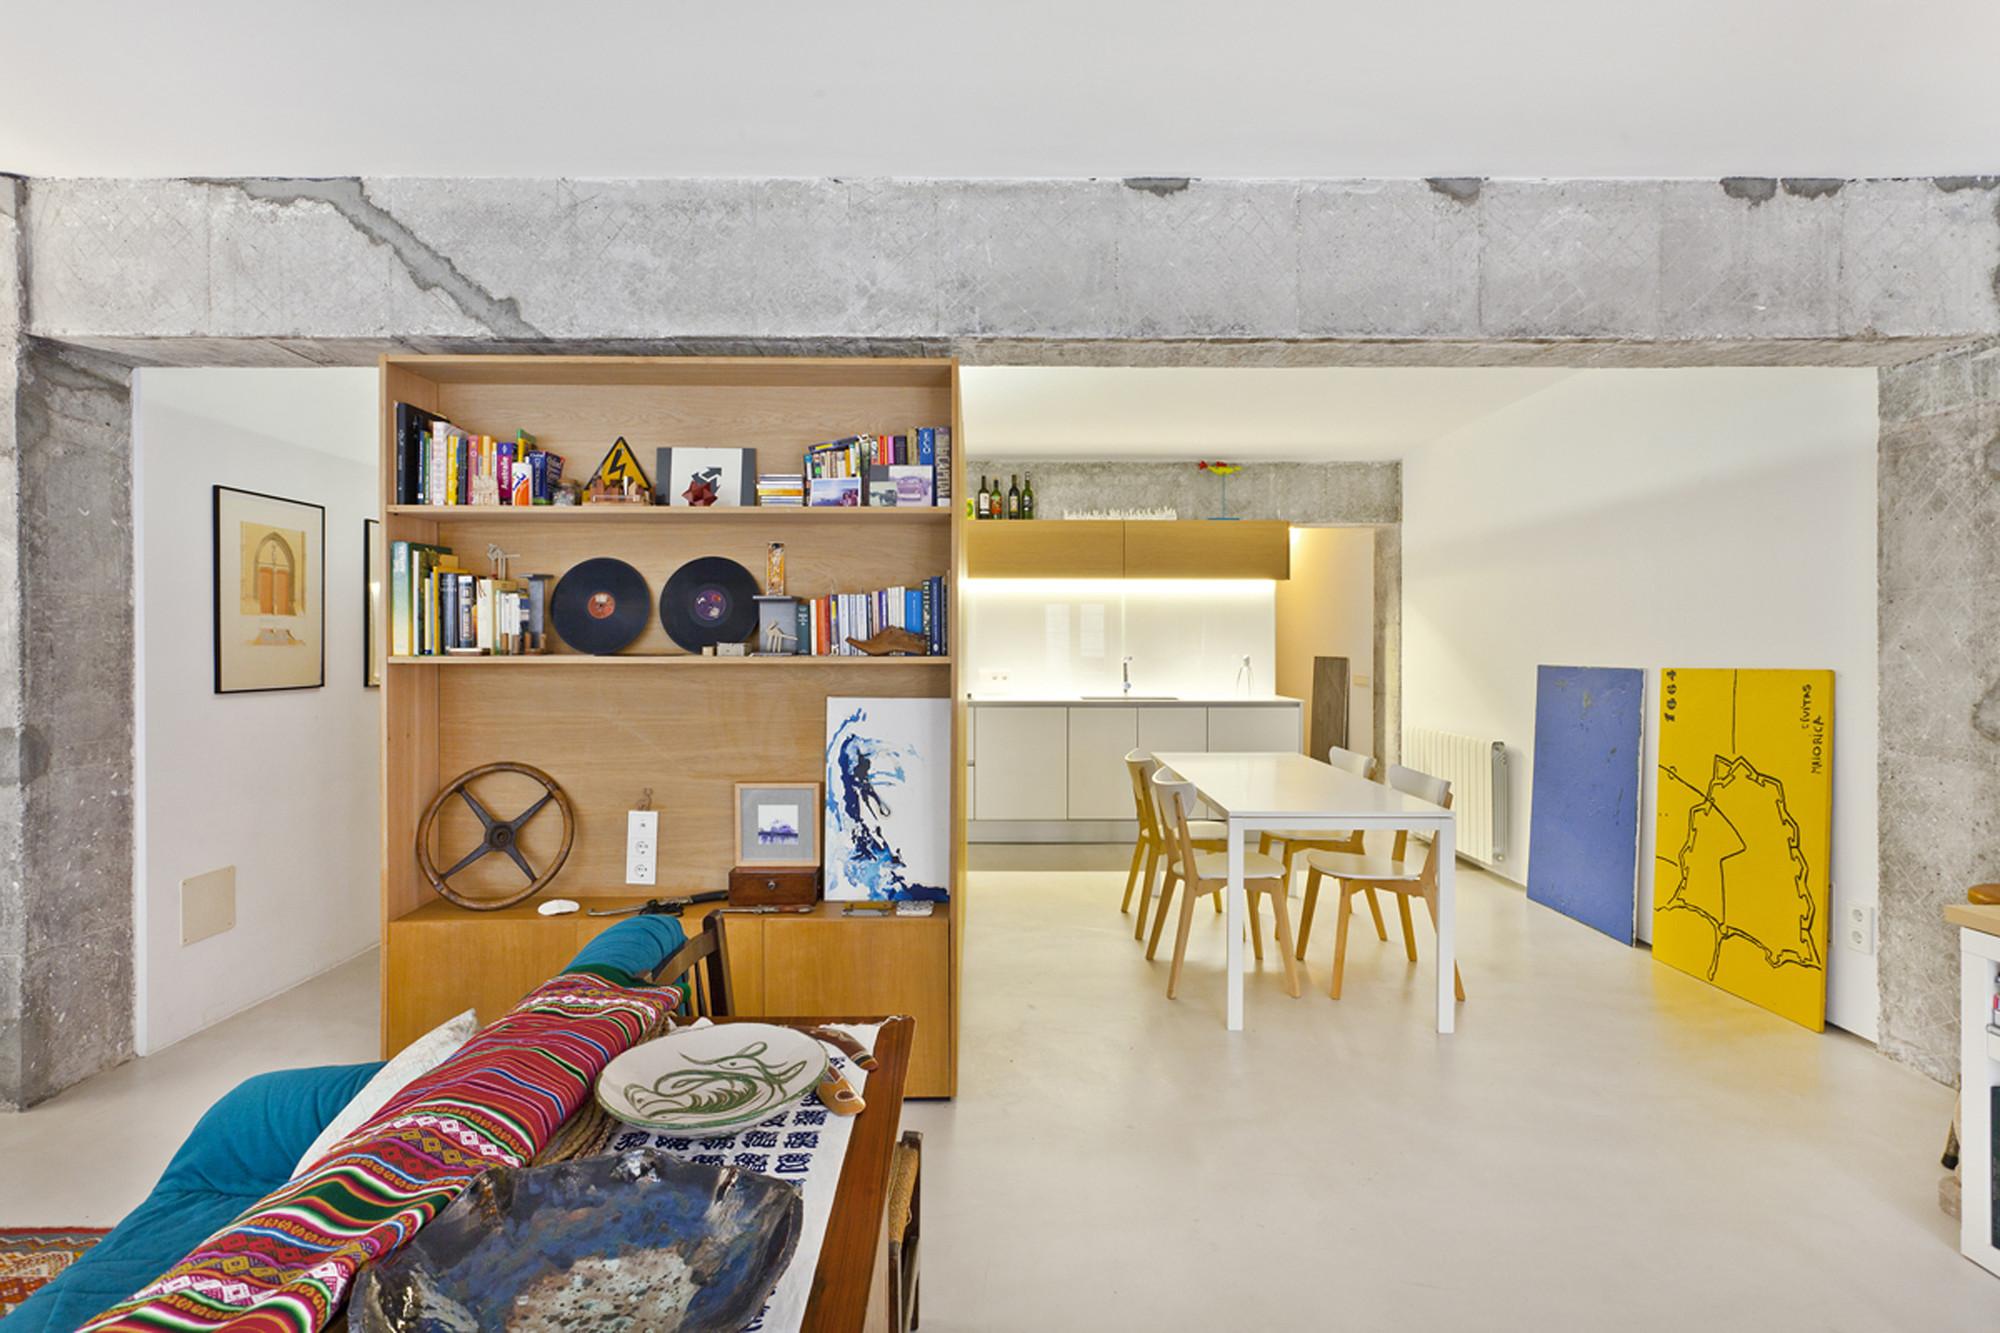 Galeria de reforma de apartamento em palma de mallorca vila segui arquitectos 1 - Arquitectos palma de mallorca ...